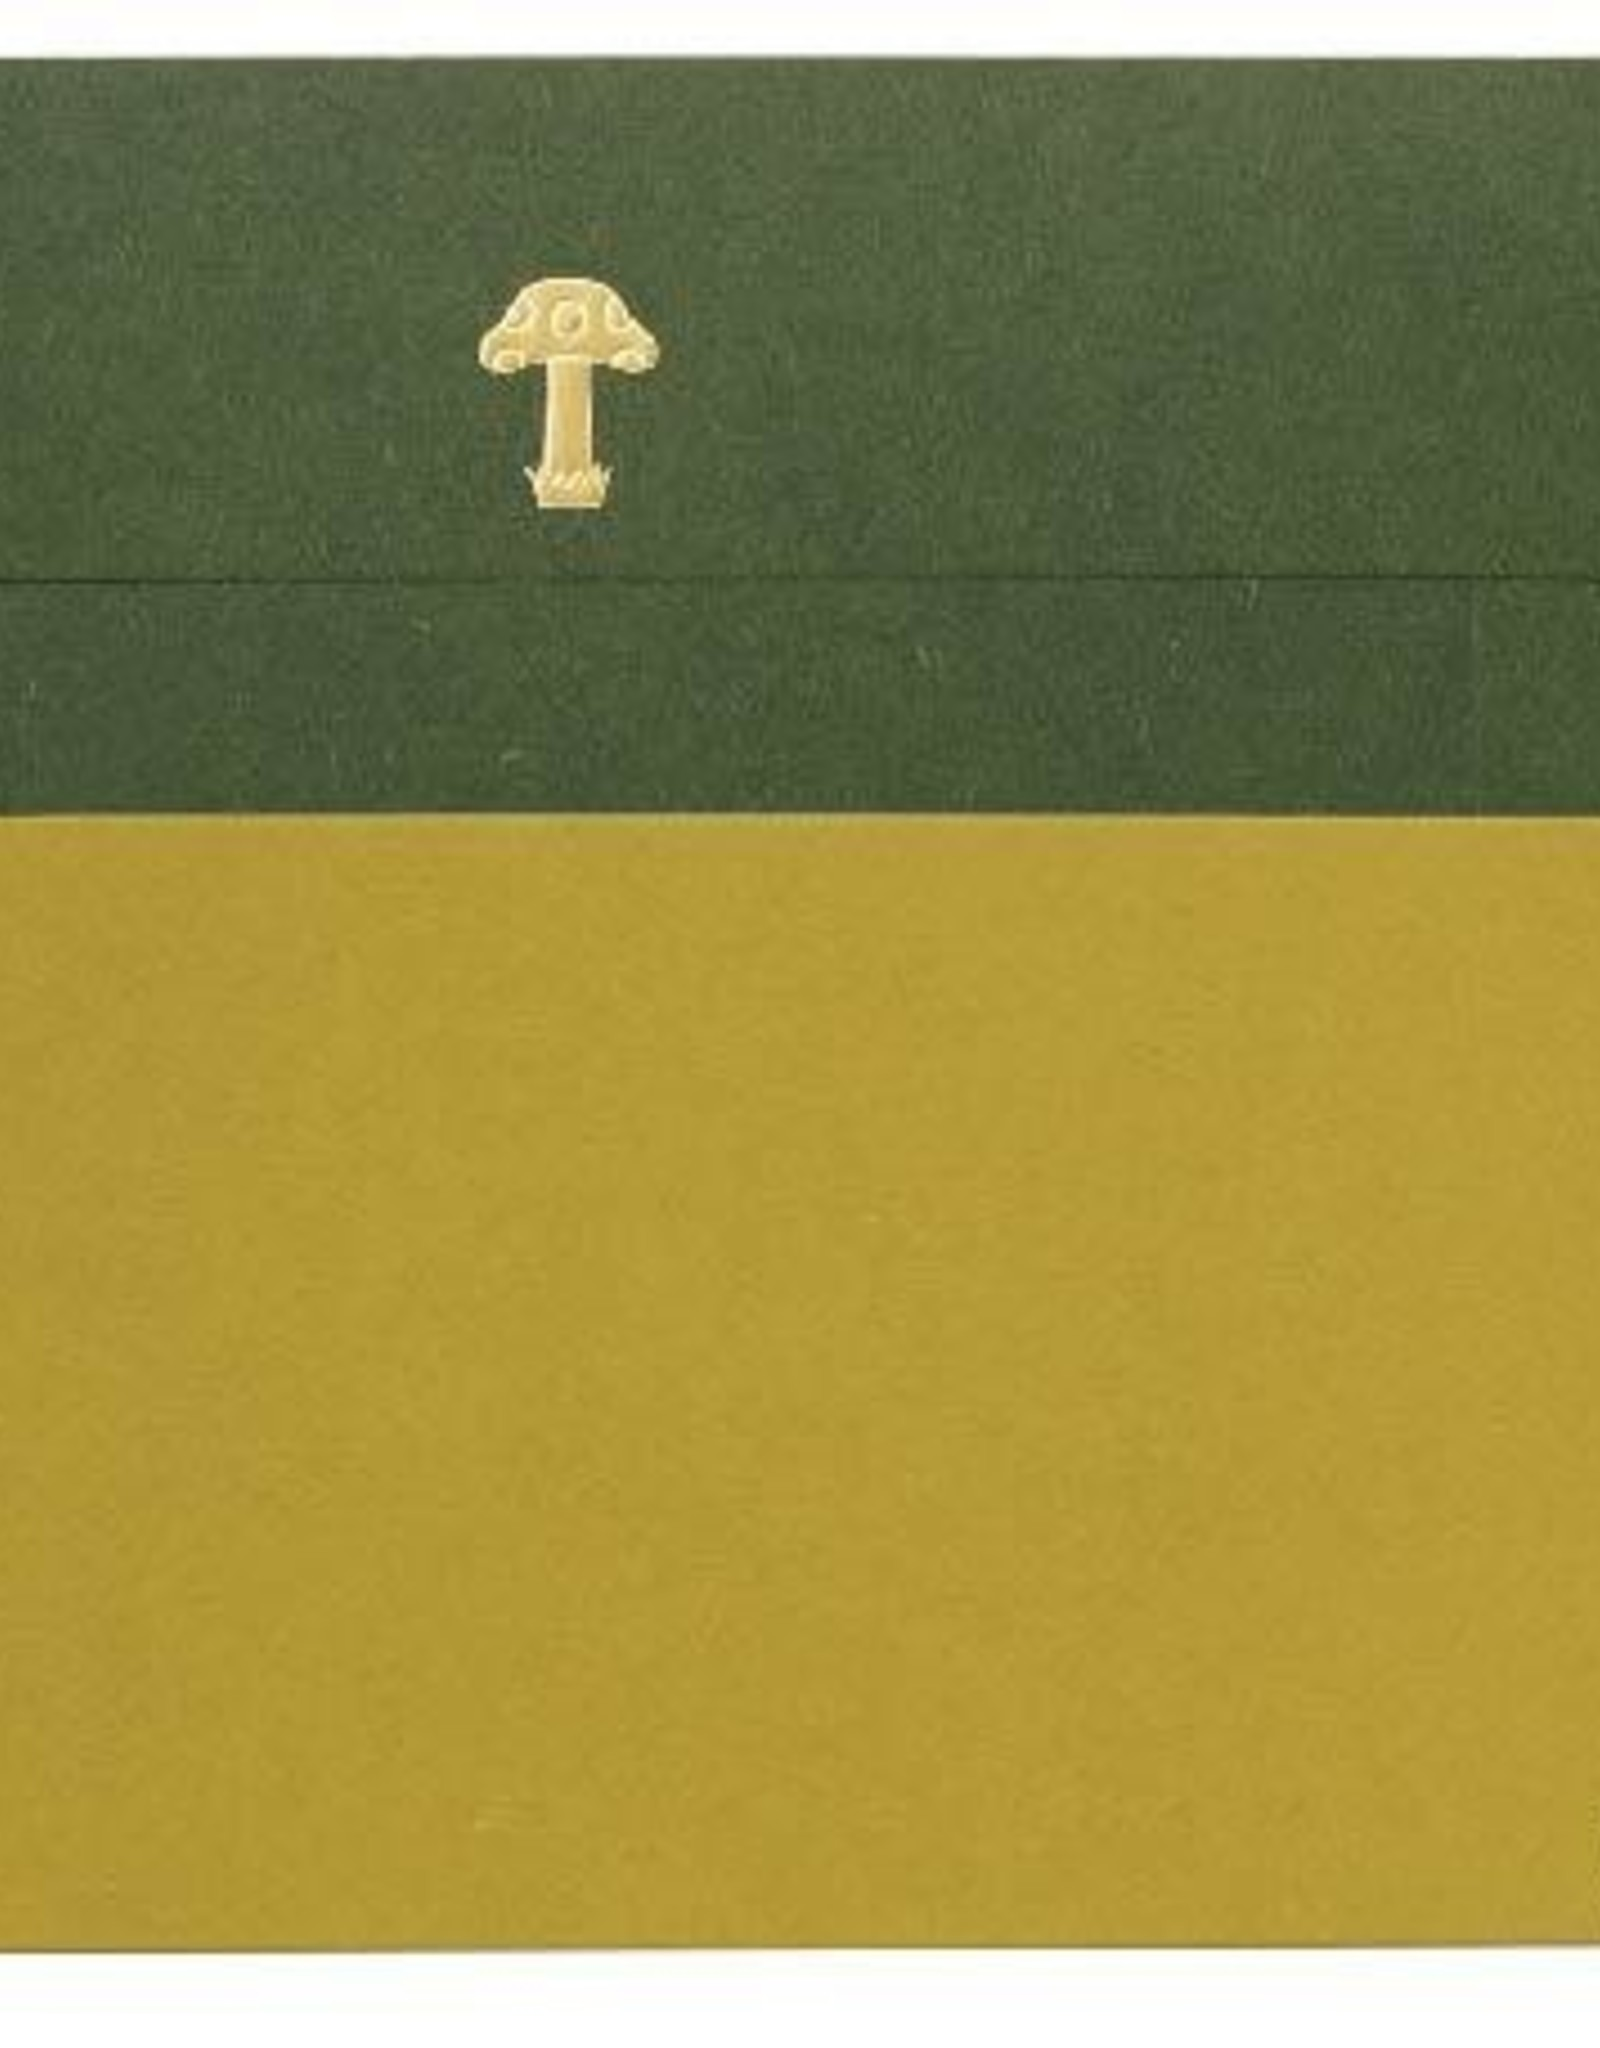 Cashico Card mushroom